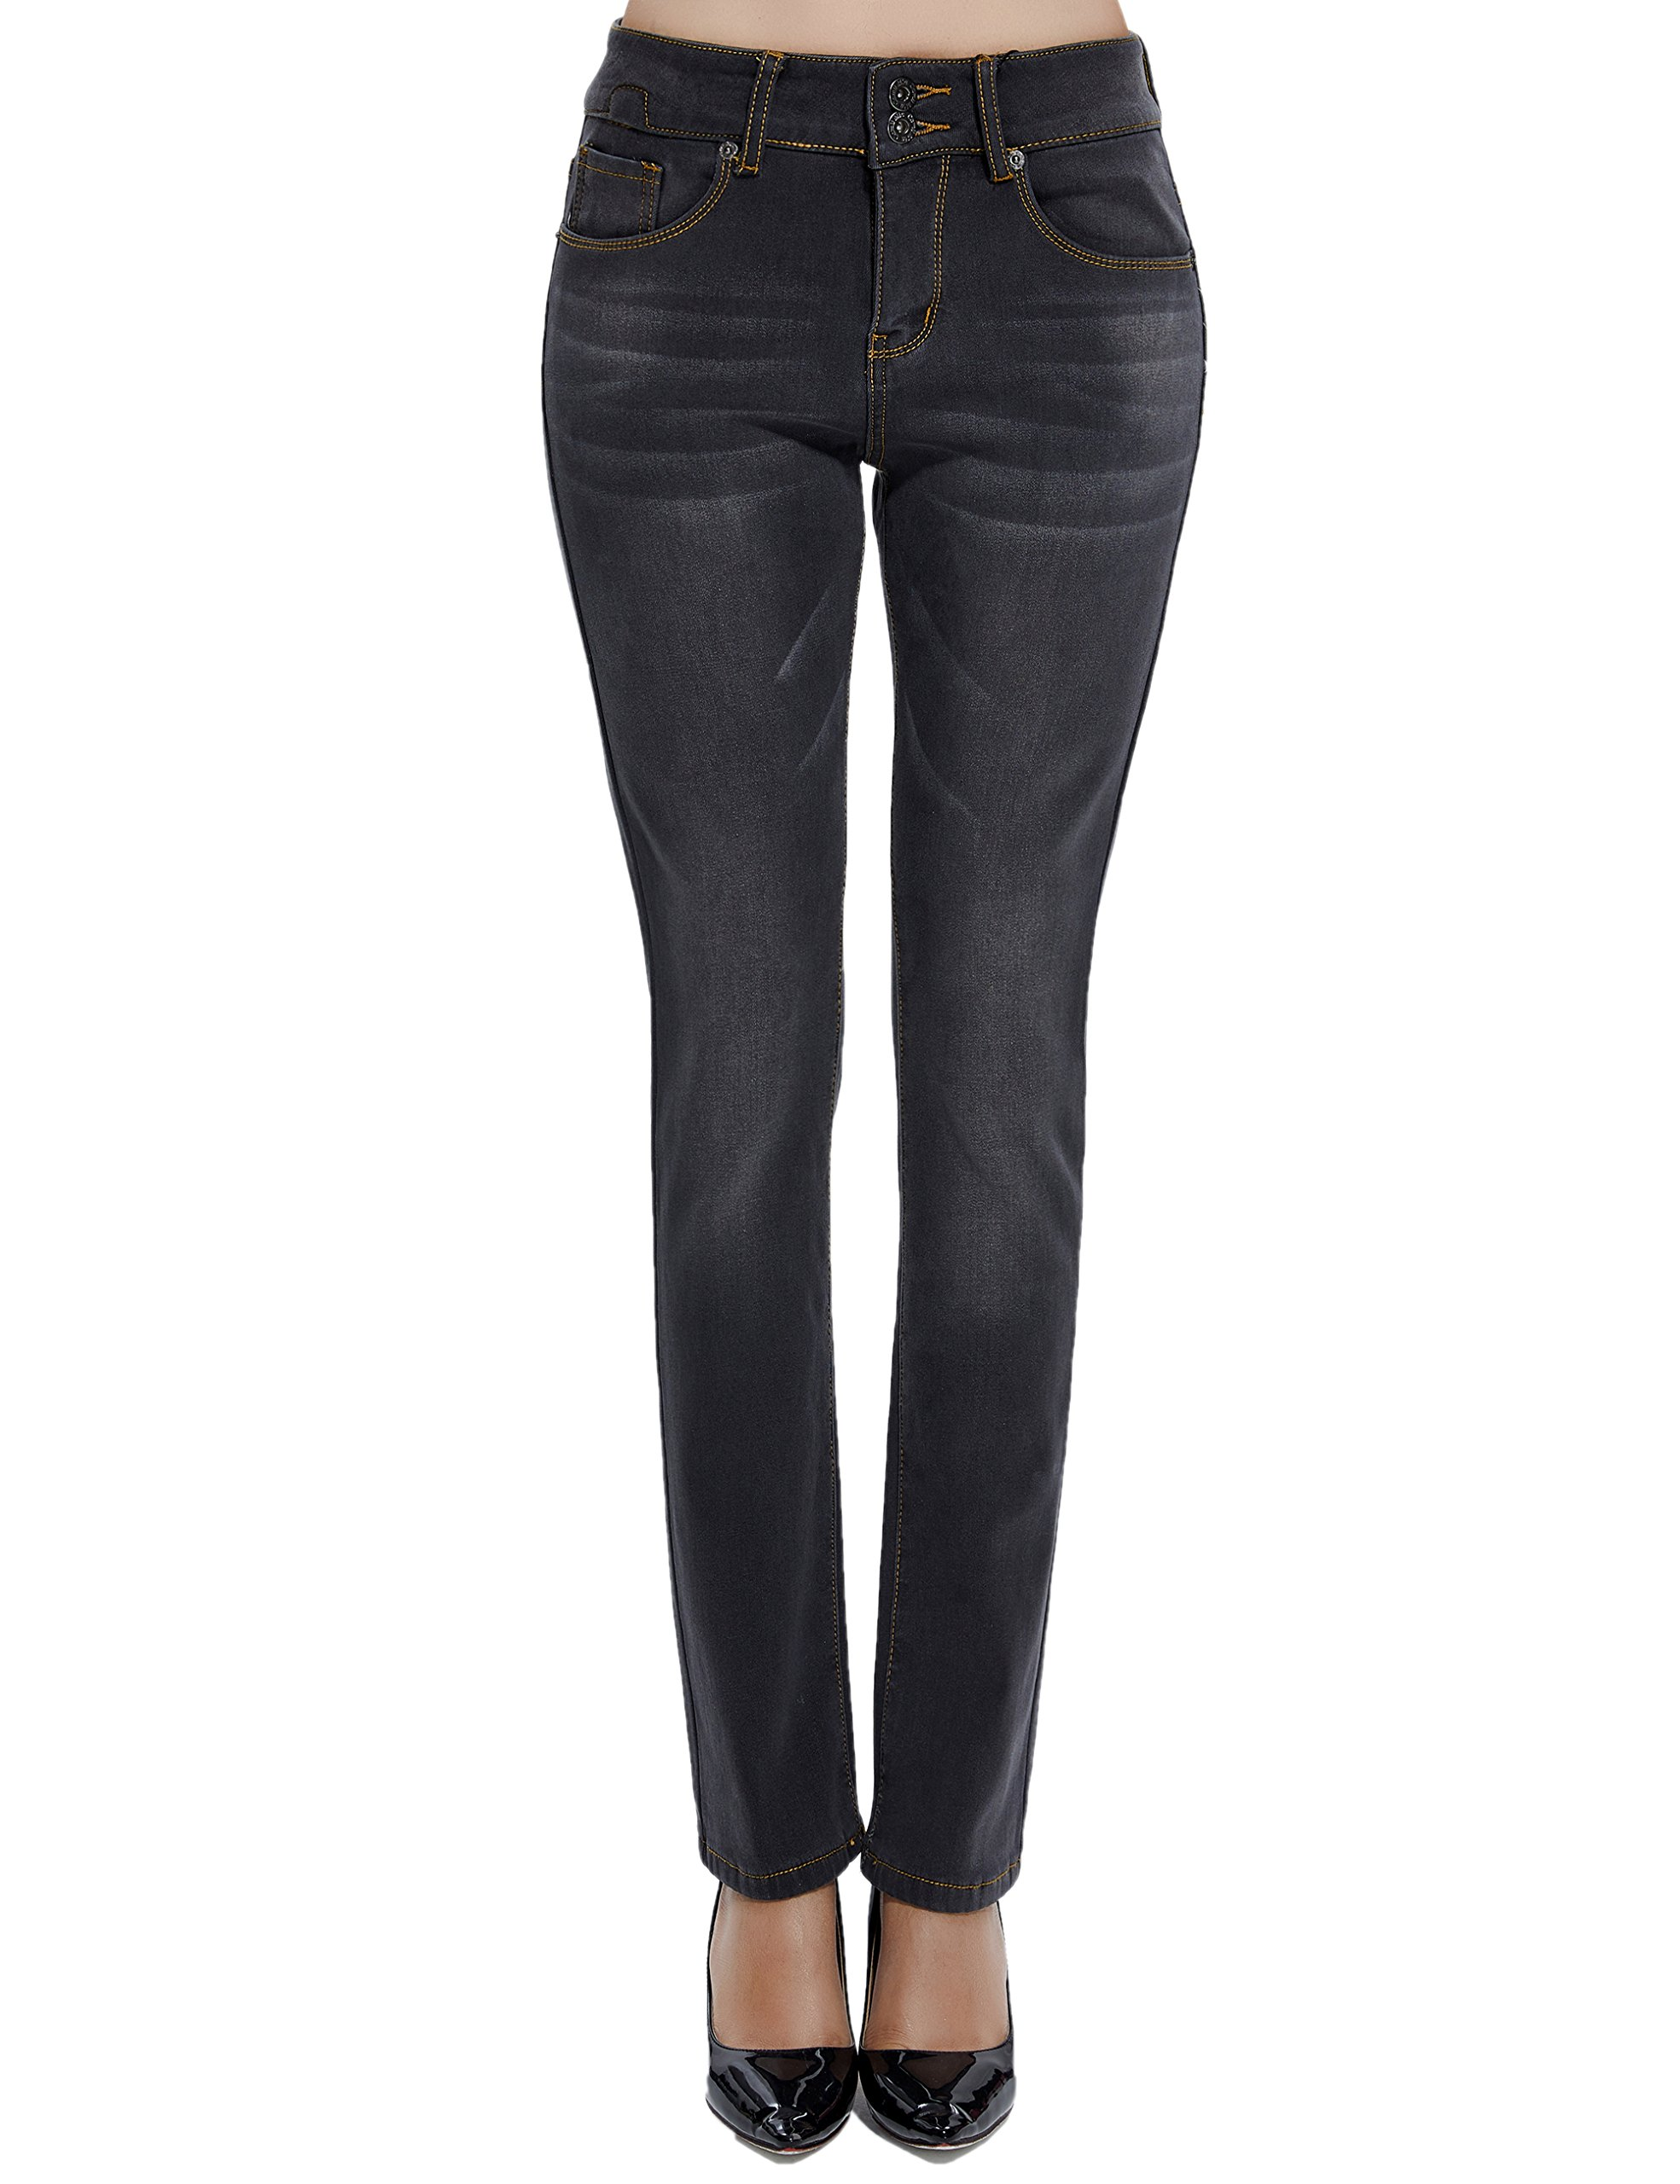 Camii Mia Women's Winter Regular Fit Fleece Lined Thermal Jeans (W26 x L30, Grey)